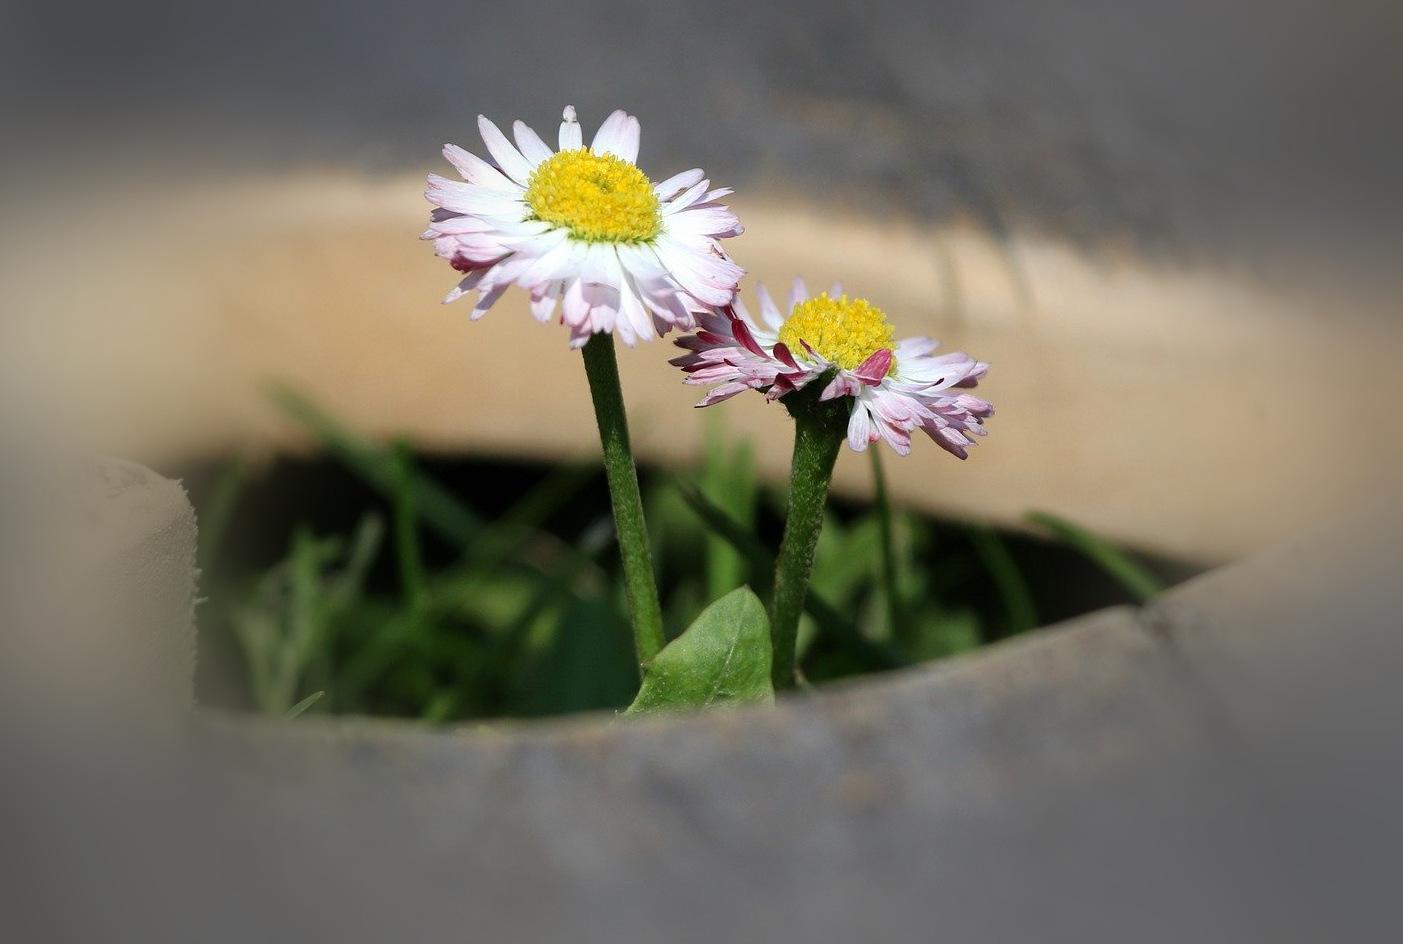 nudge flower